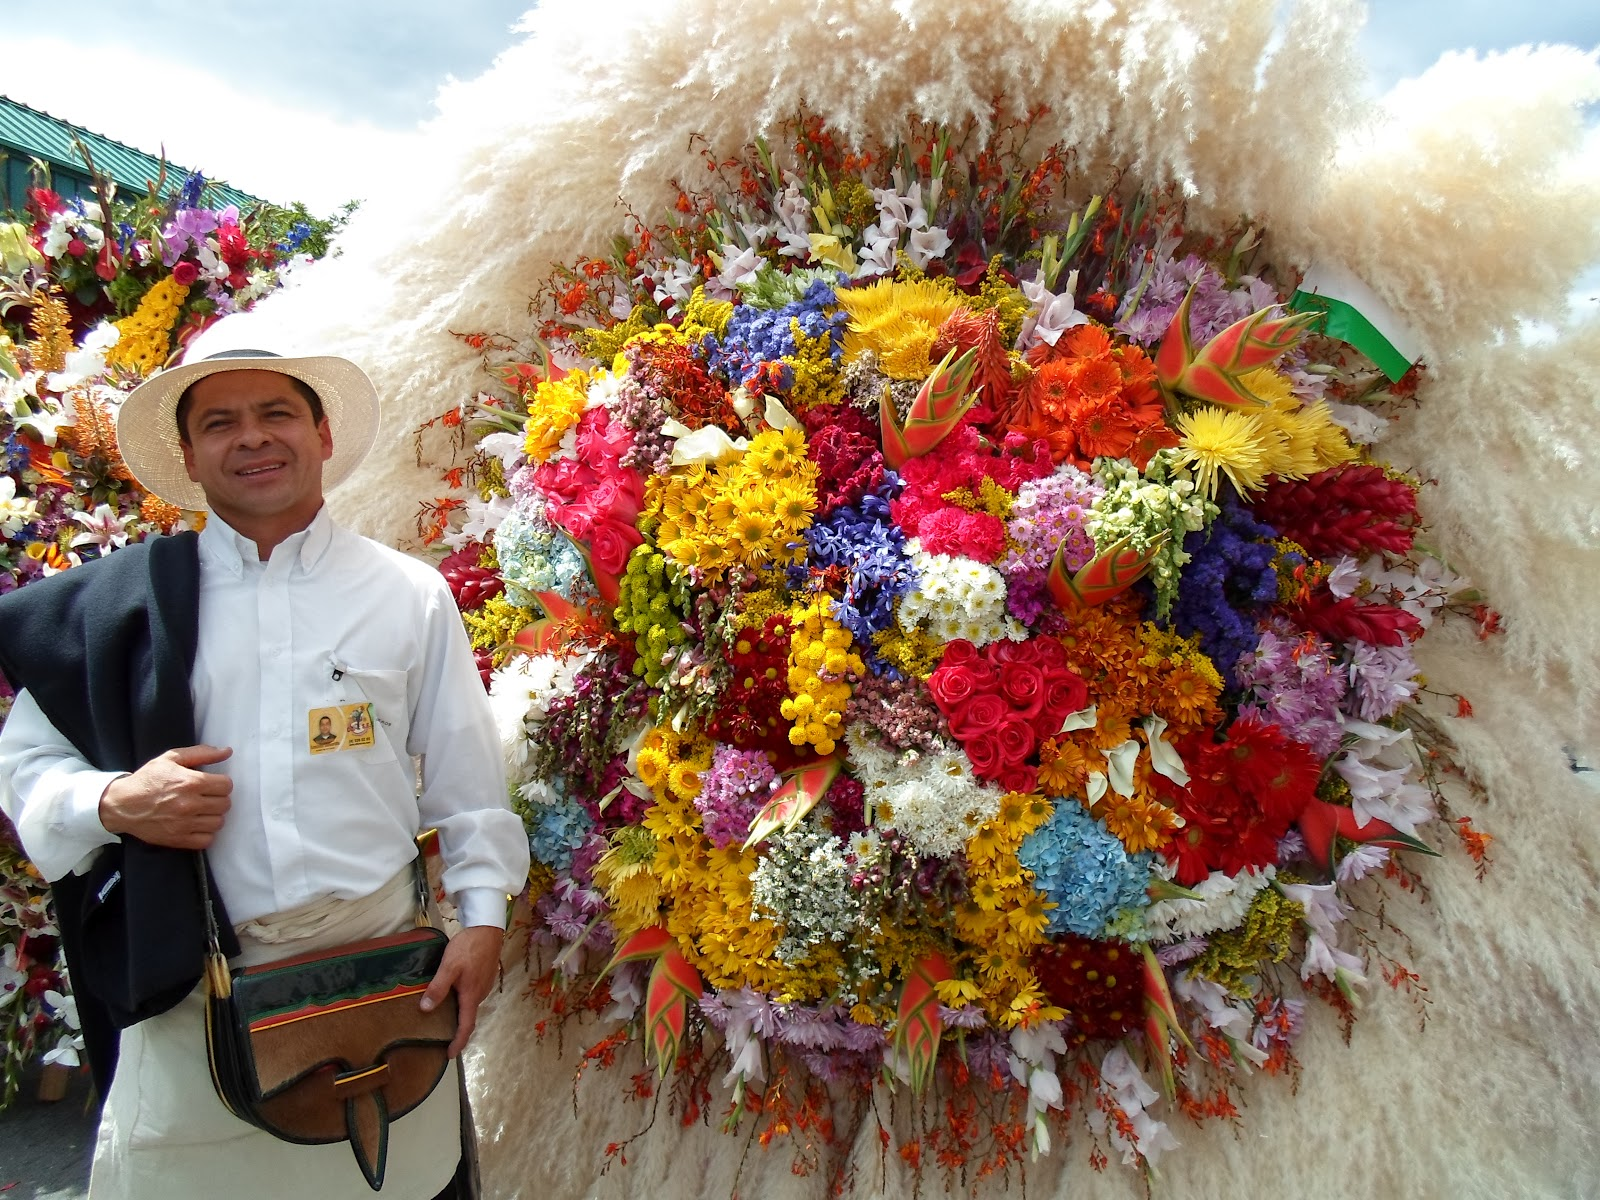 Regi n andina festividades y festivales for Silletas para ninos